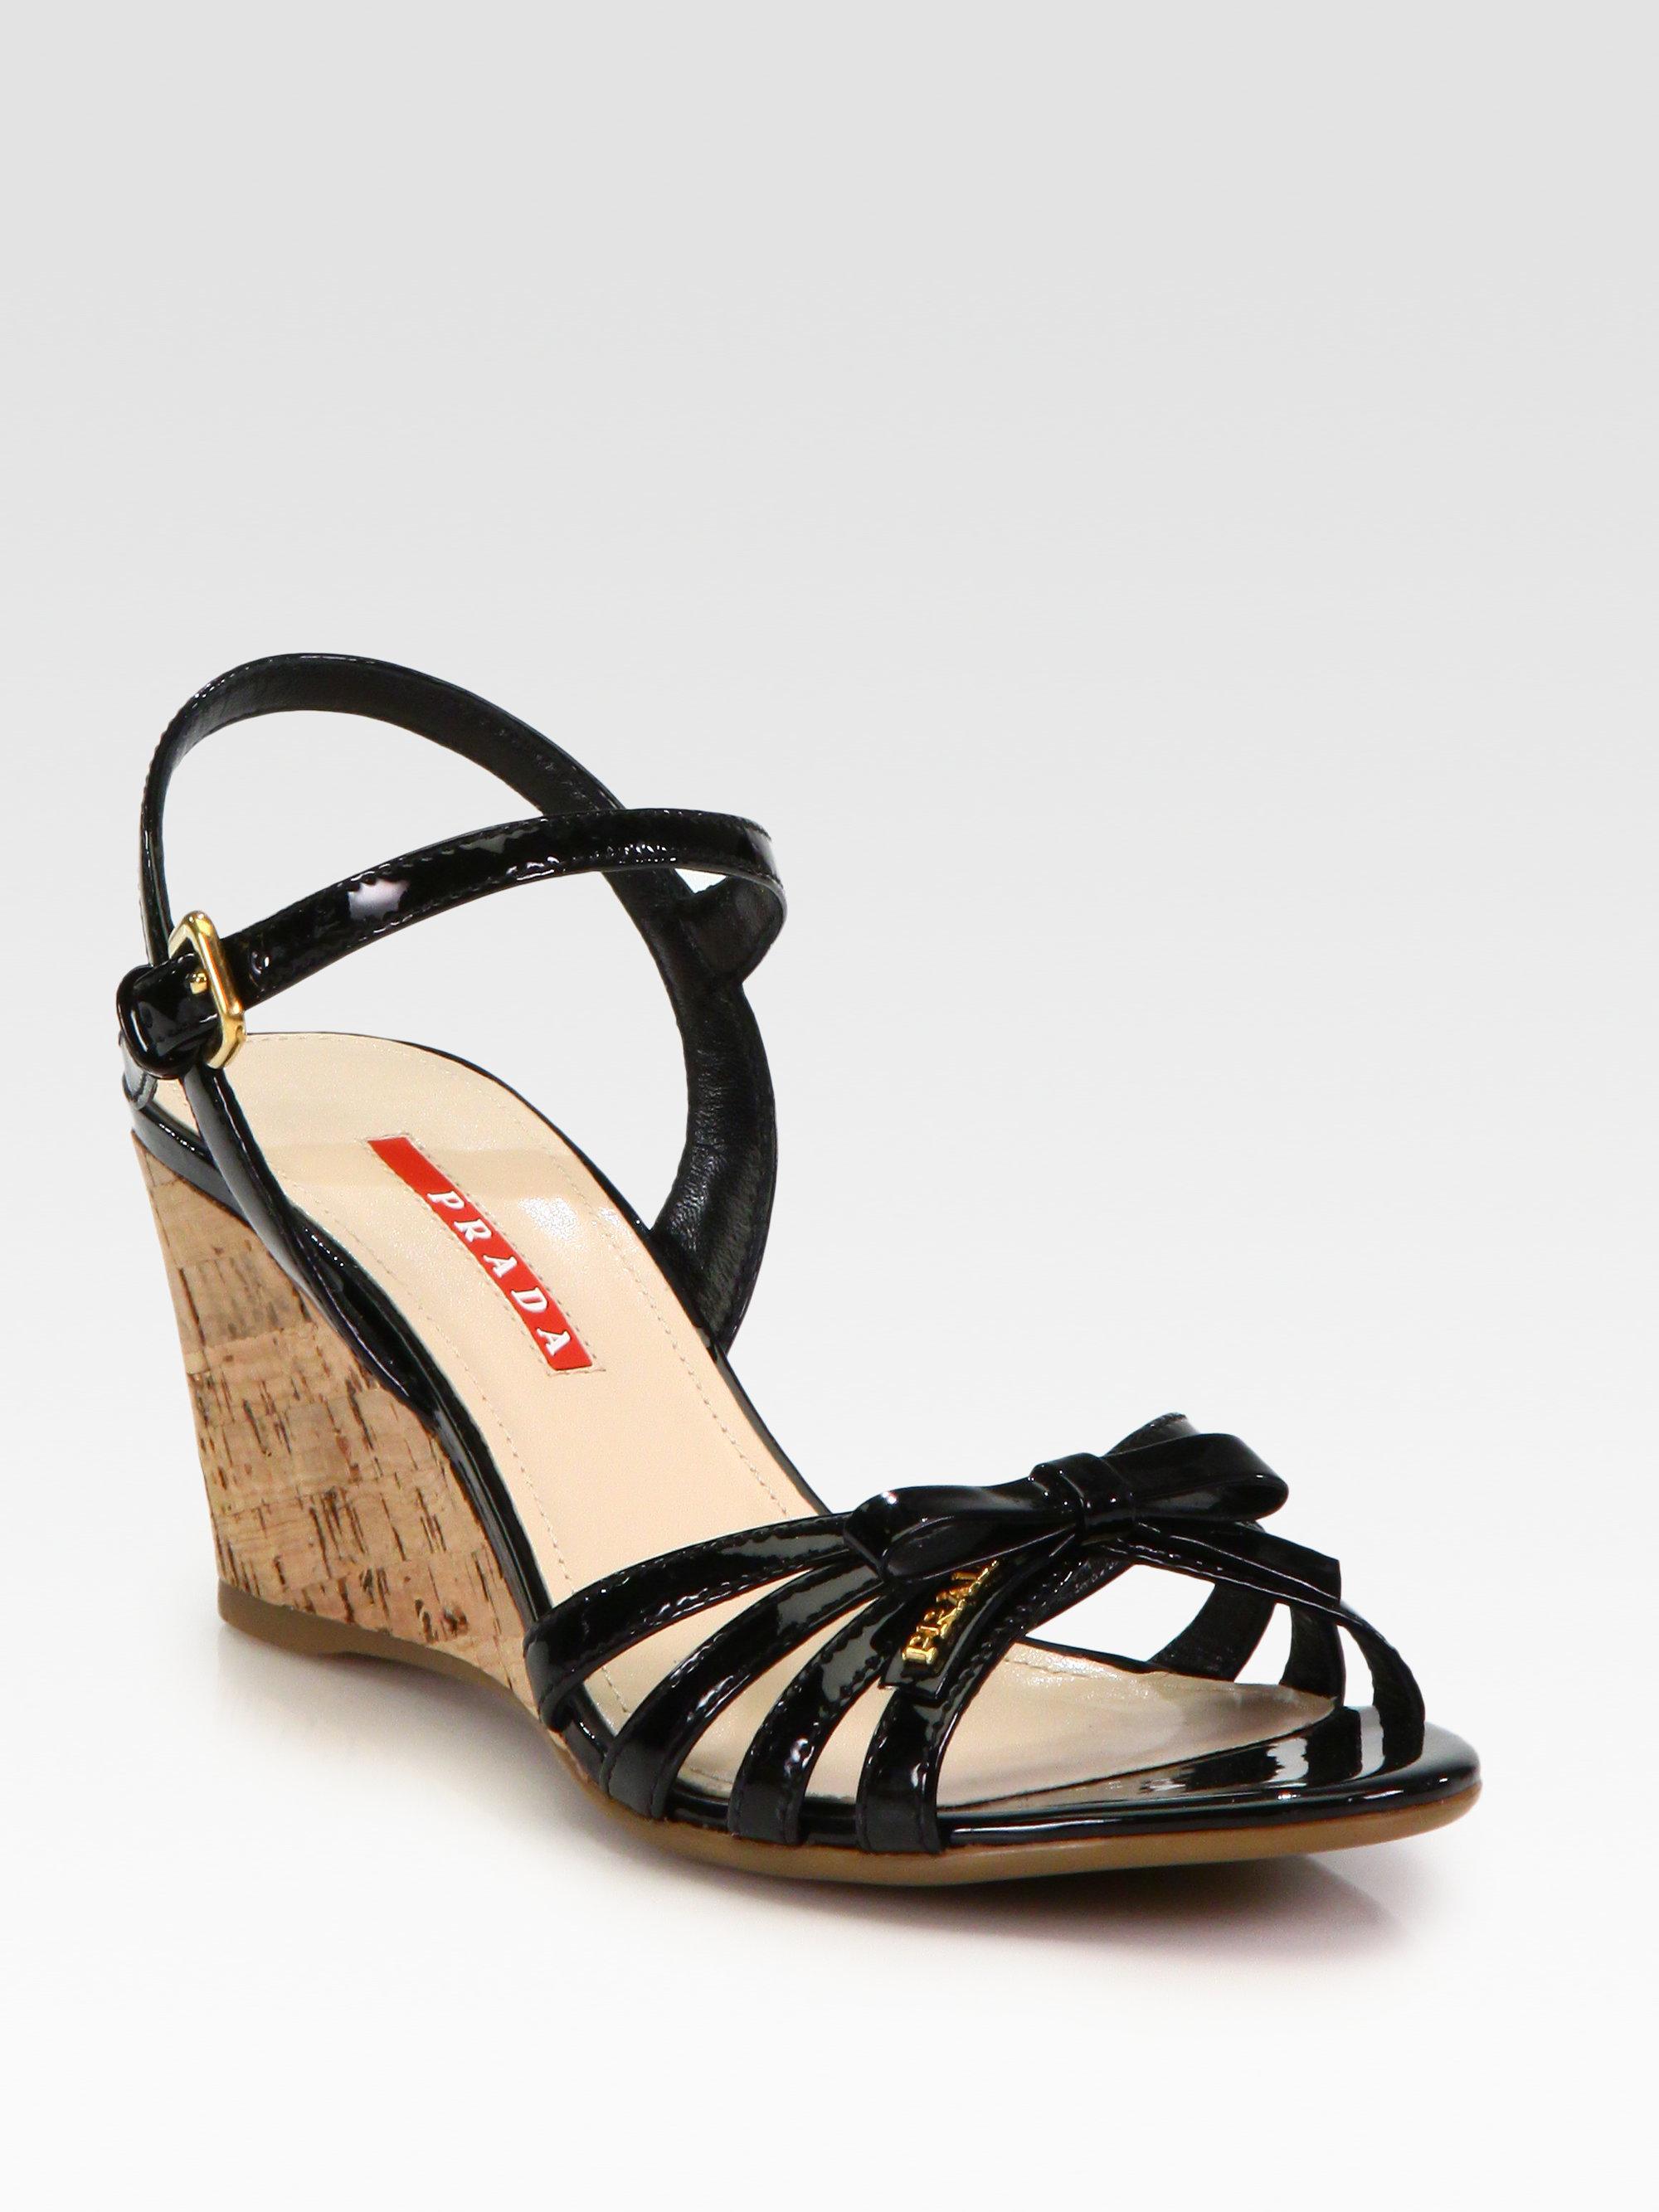 53597b87f1b Prada Leather Bow Cork Wedge Sandals in Black - Lyst